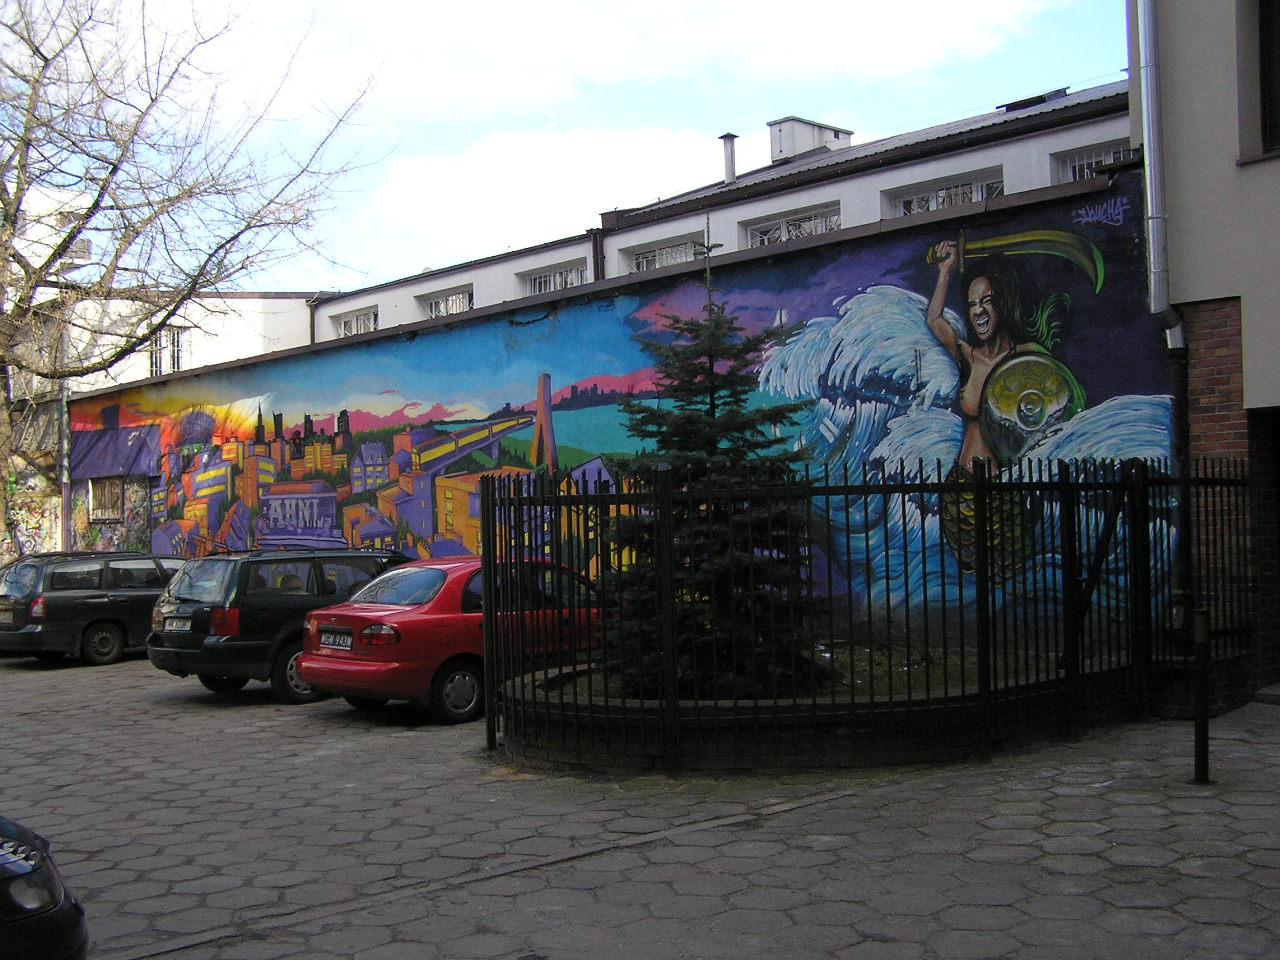 Mural kale ska 3 warszawa groch w for Mural warszawa 44